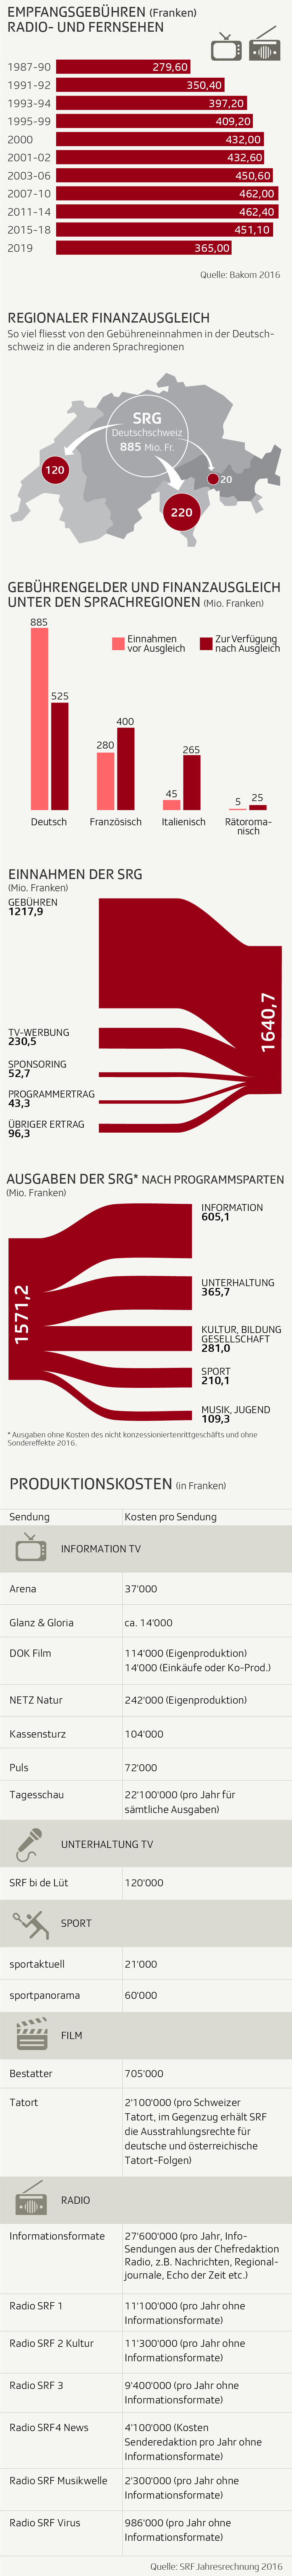 Infografik: Infografik No Billag Ganzes SRF